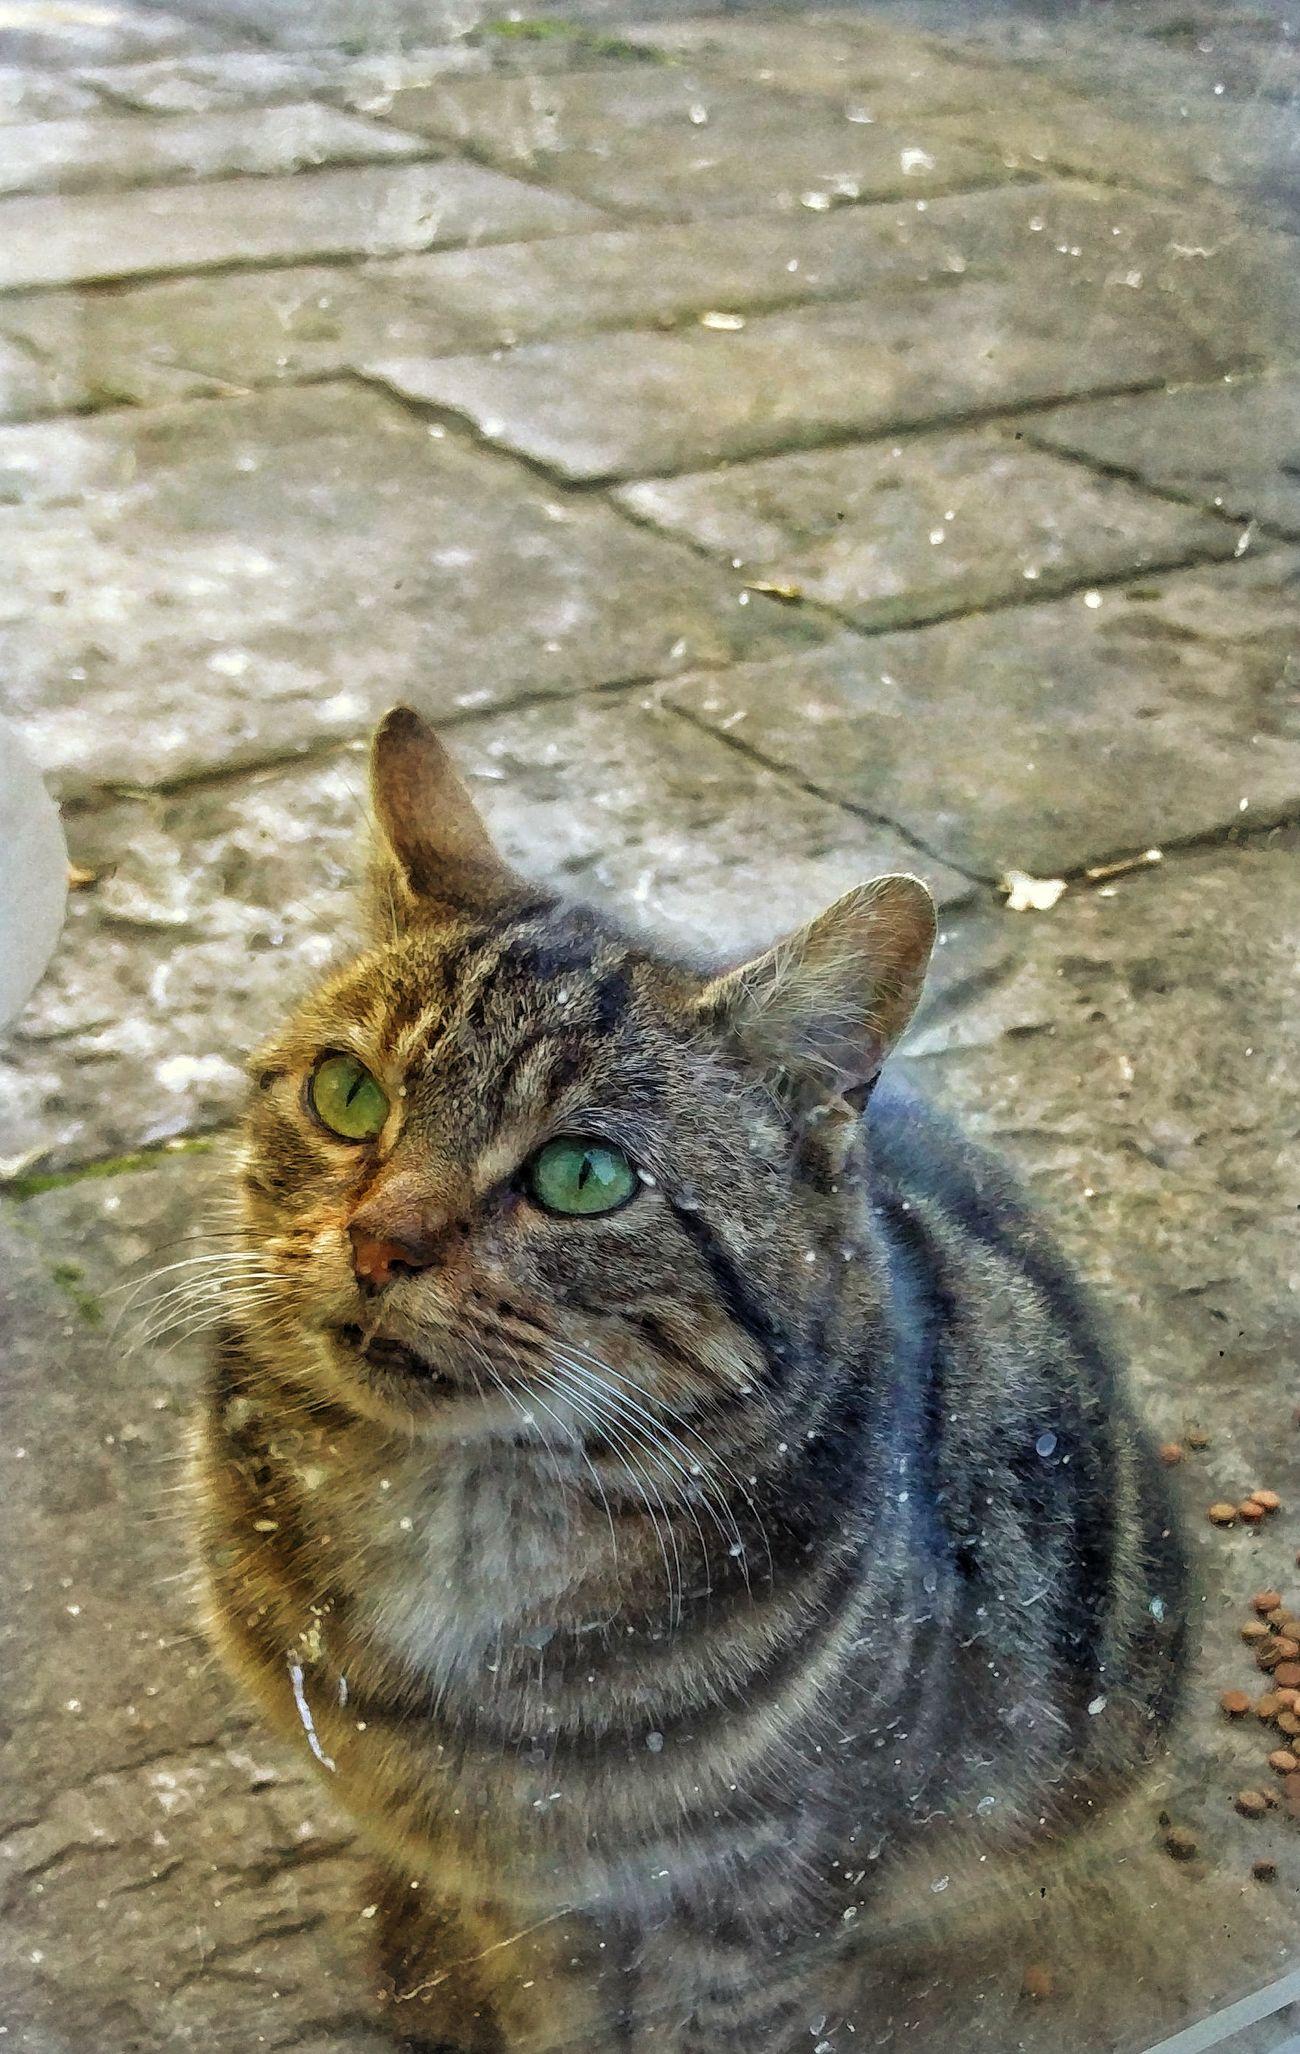 Cat Cats 🐱 Kitten 🐱 Grey Rainy Days Cat In Rain EyeEmNewHere